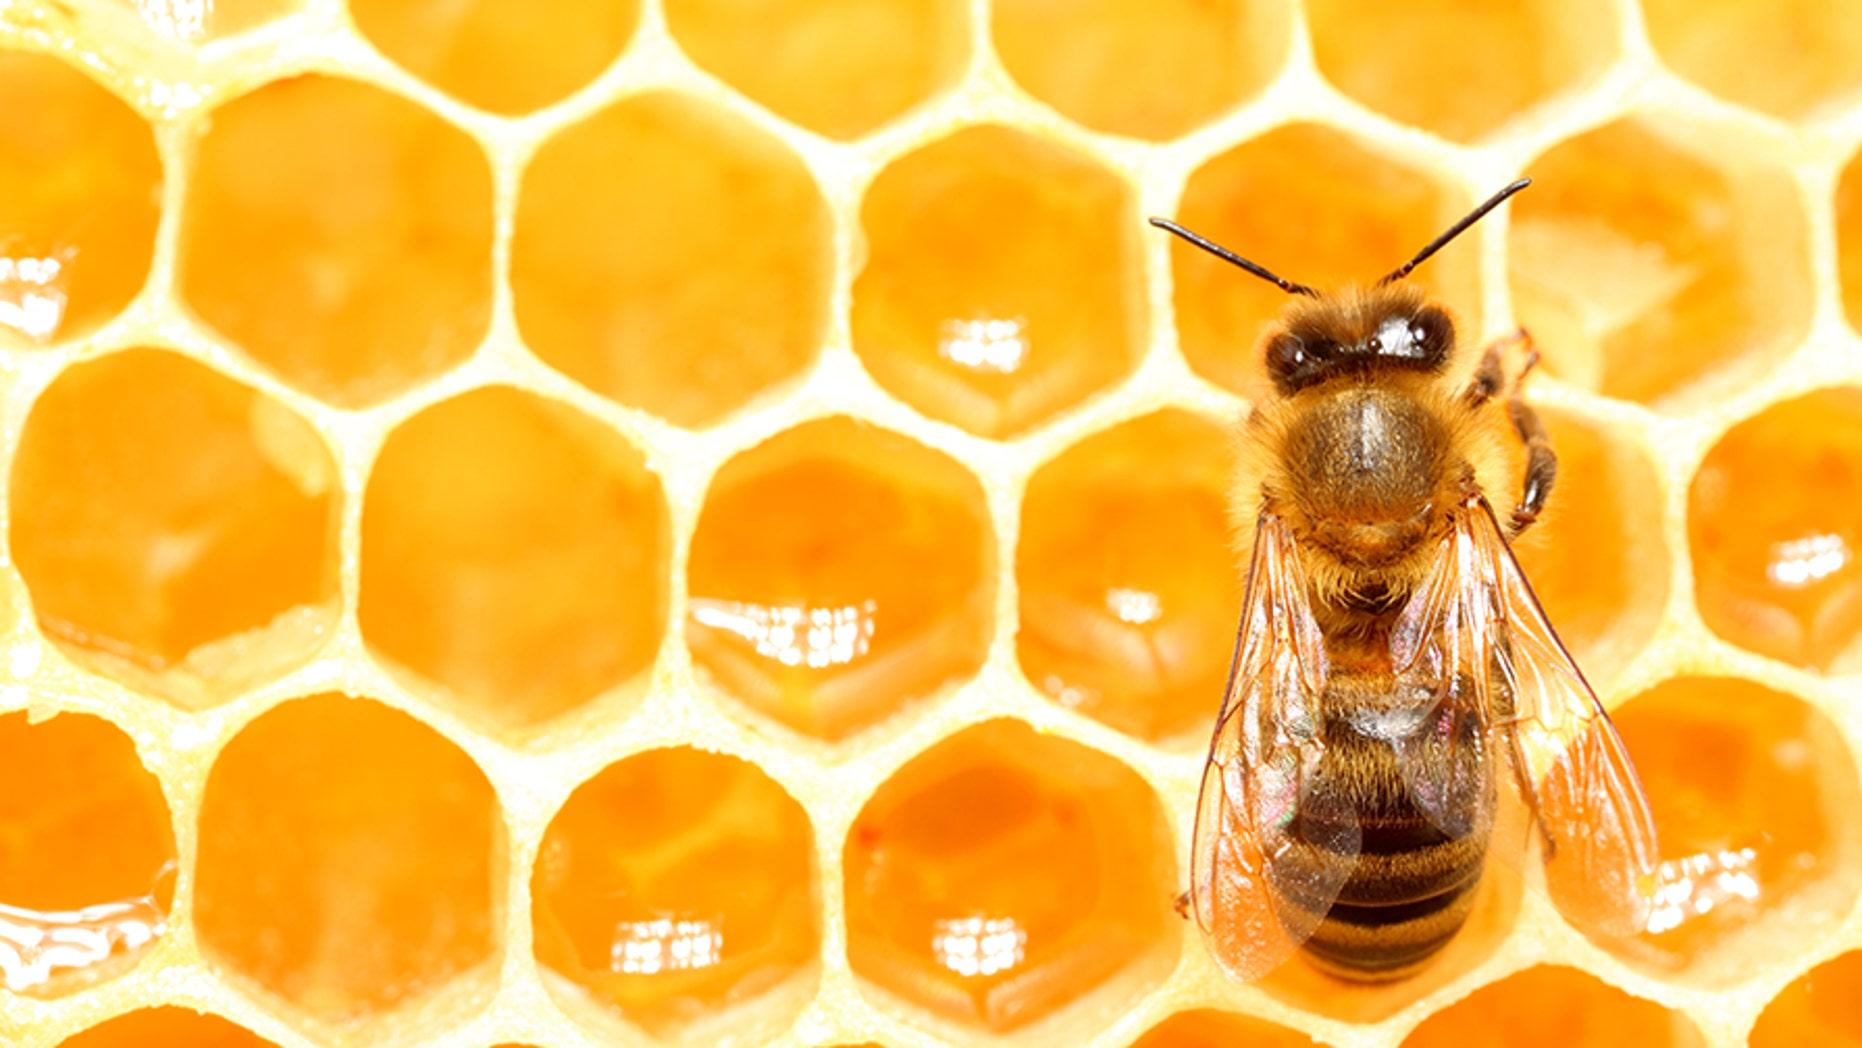 Bee and Honeycomb (Antagain) (Credit: iStock)